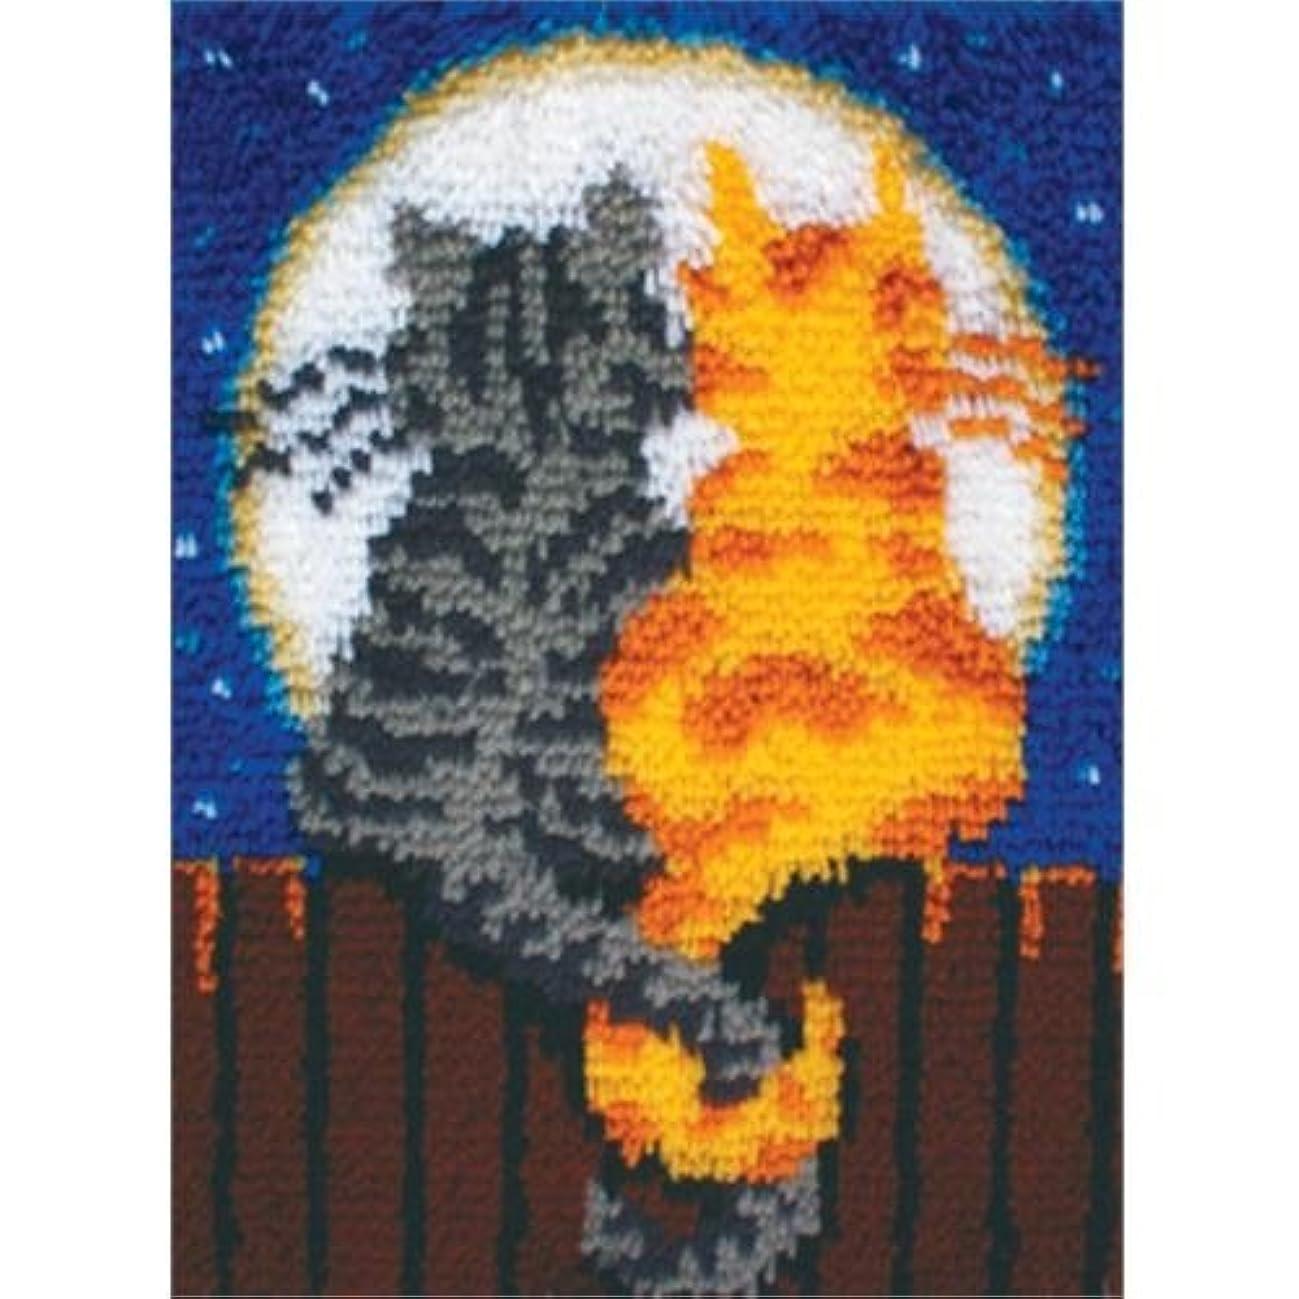 Wonderart Latch-Hook Kit, Moonlight Meow, 15